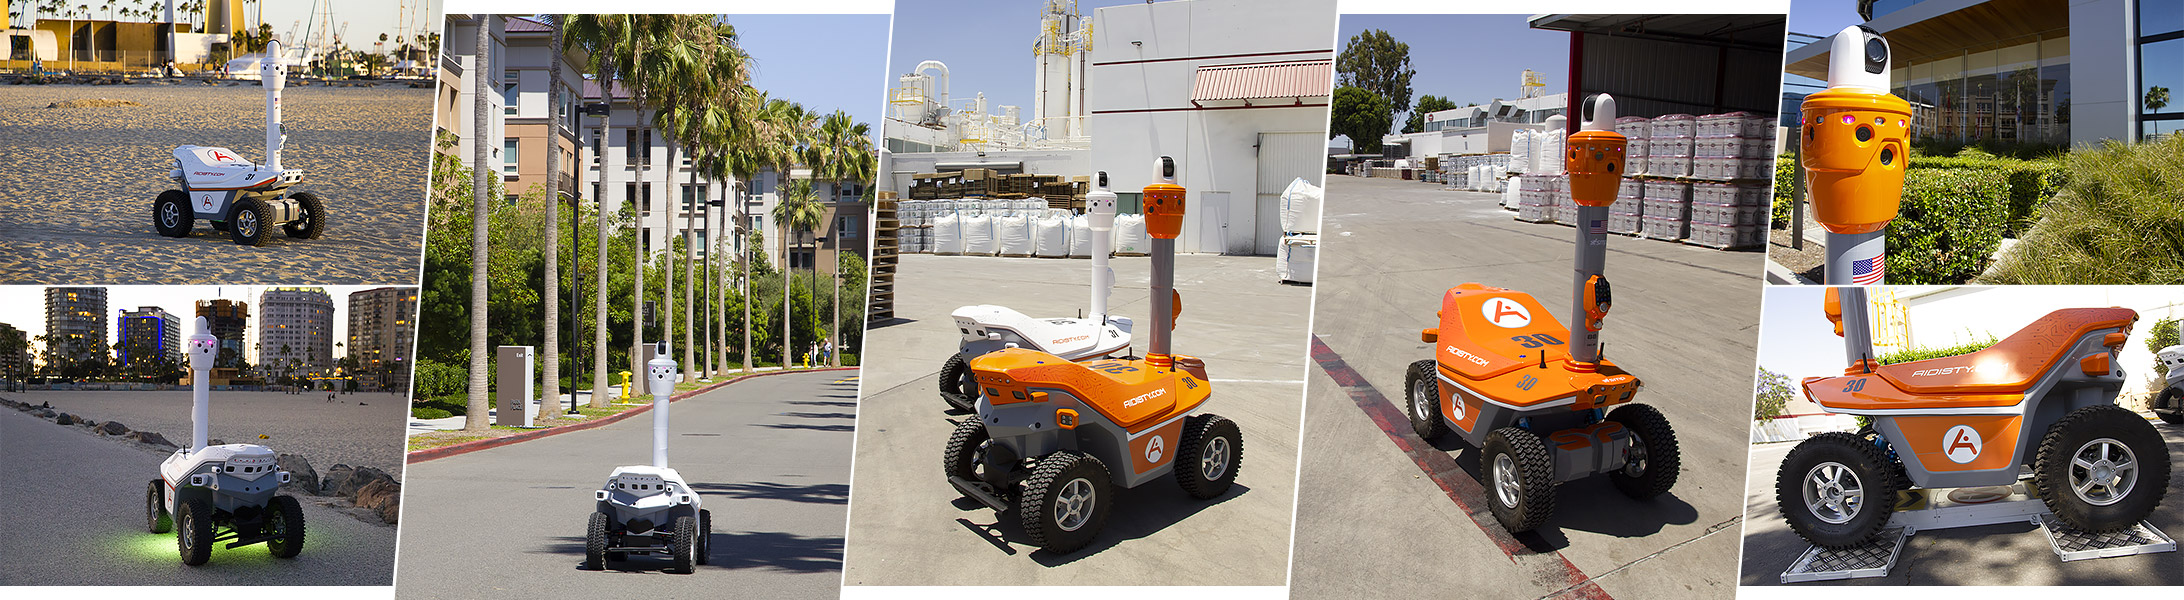 Security robots distribution